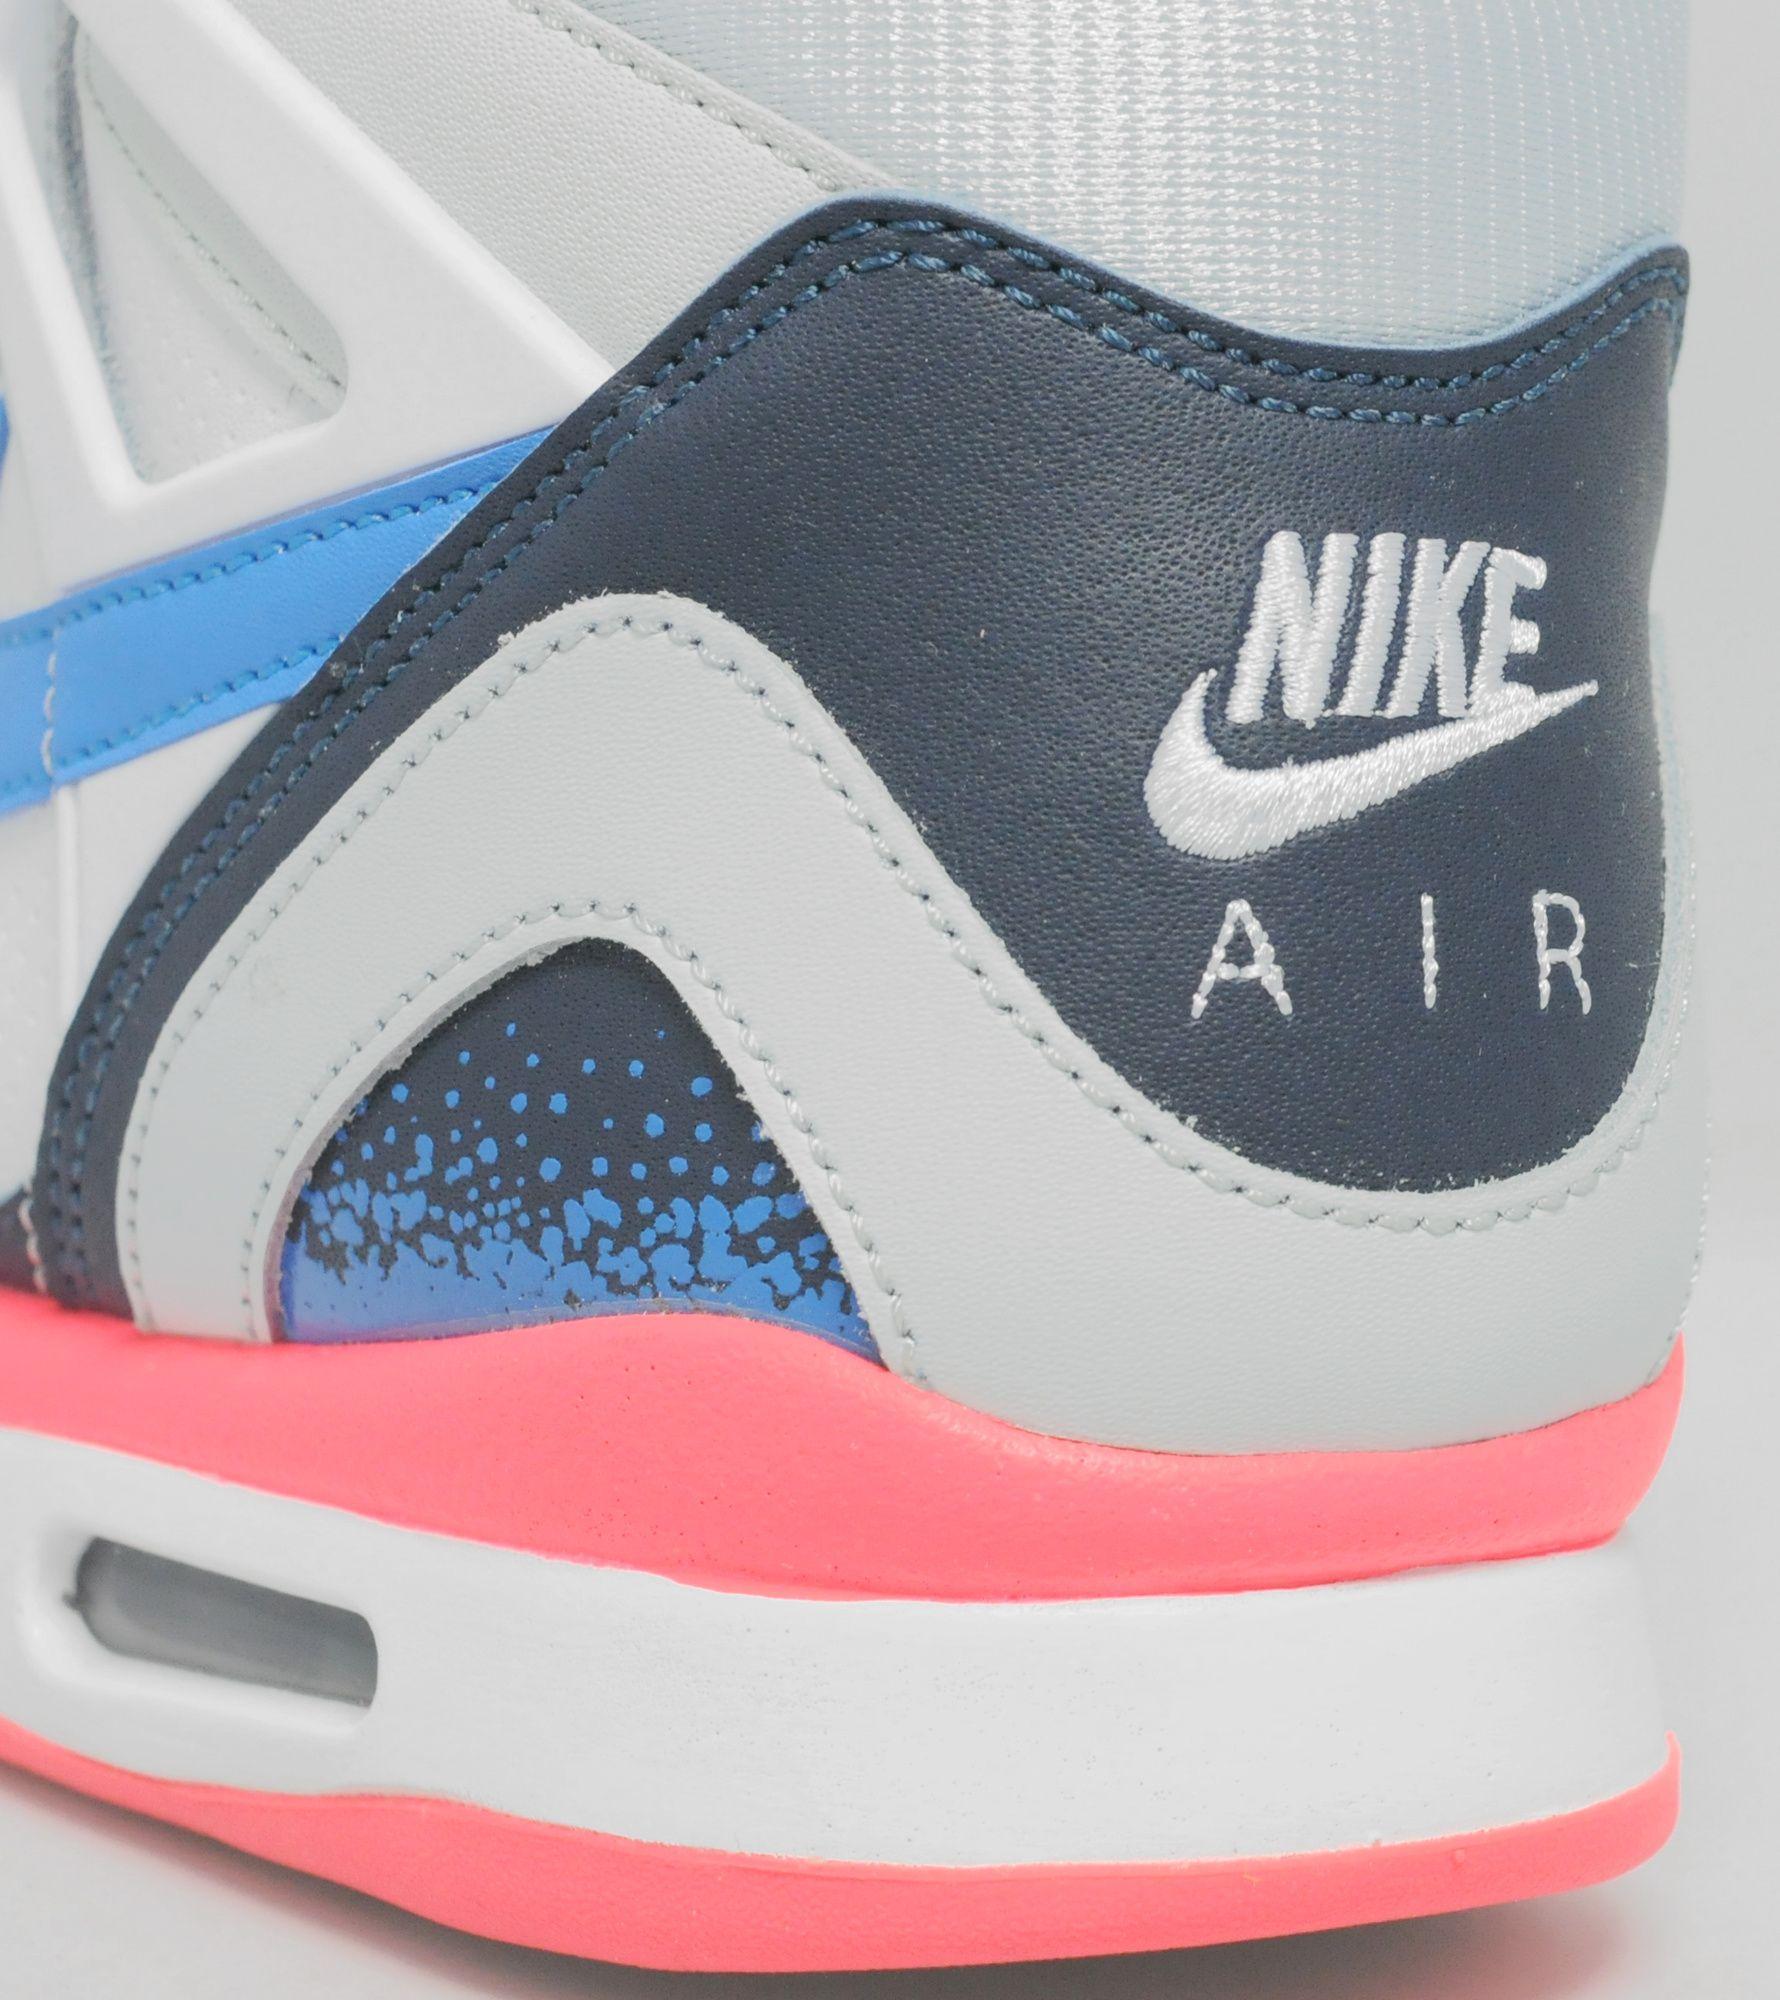 Nike Air Tech Challenge II